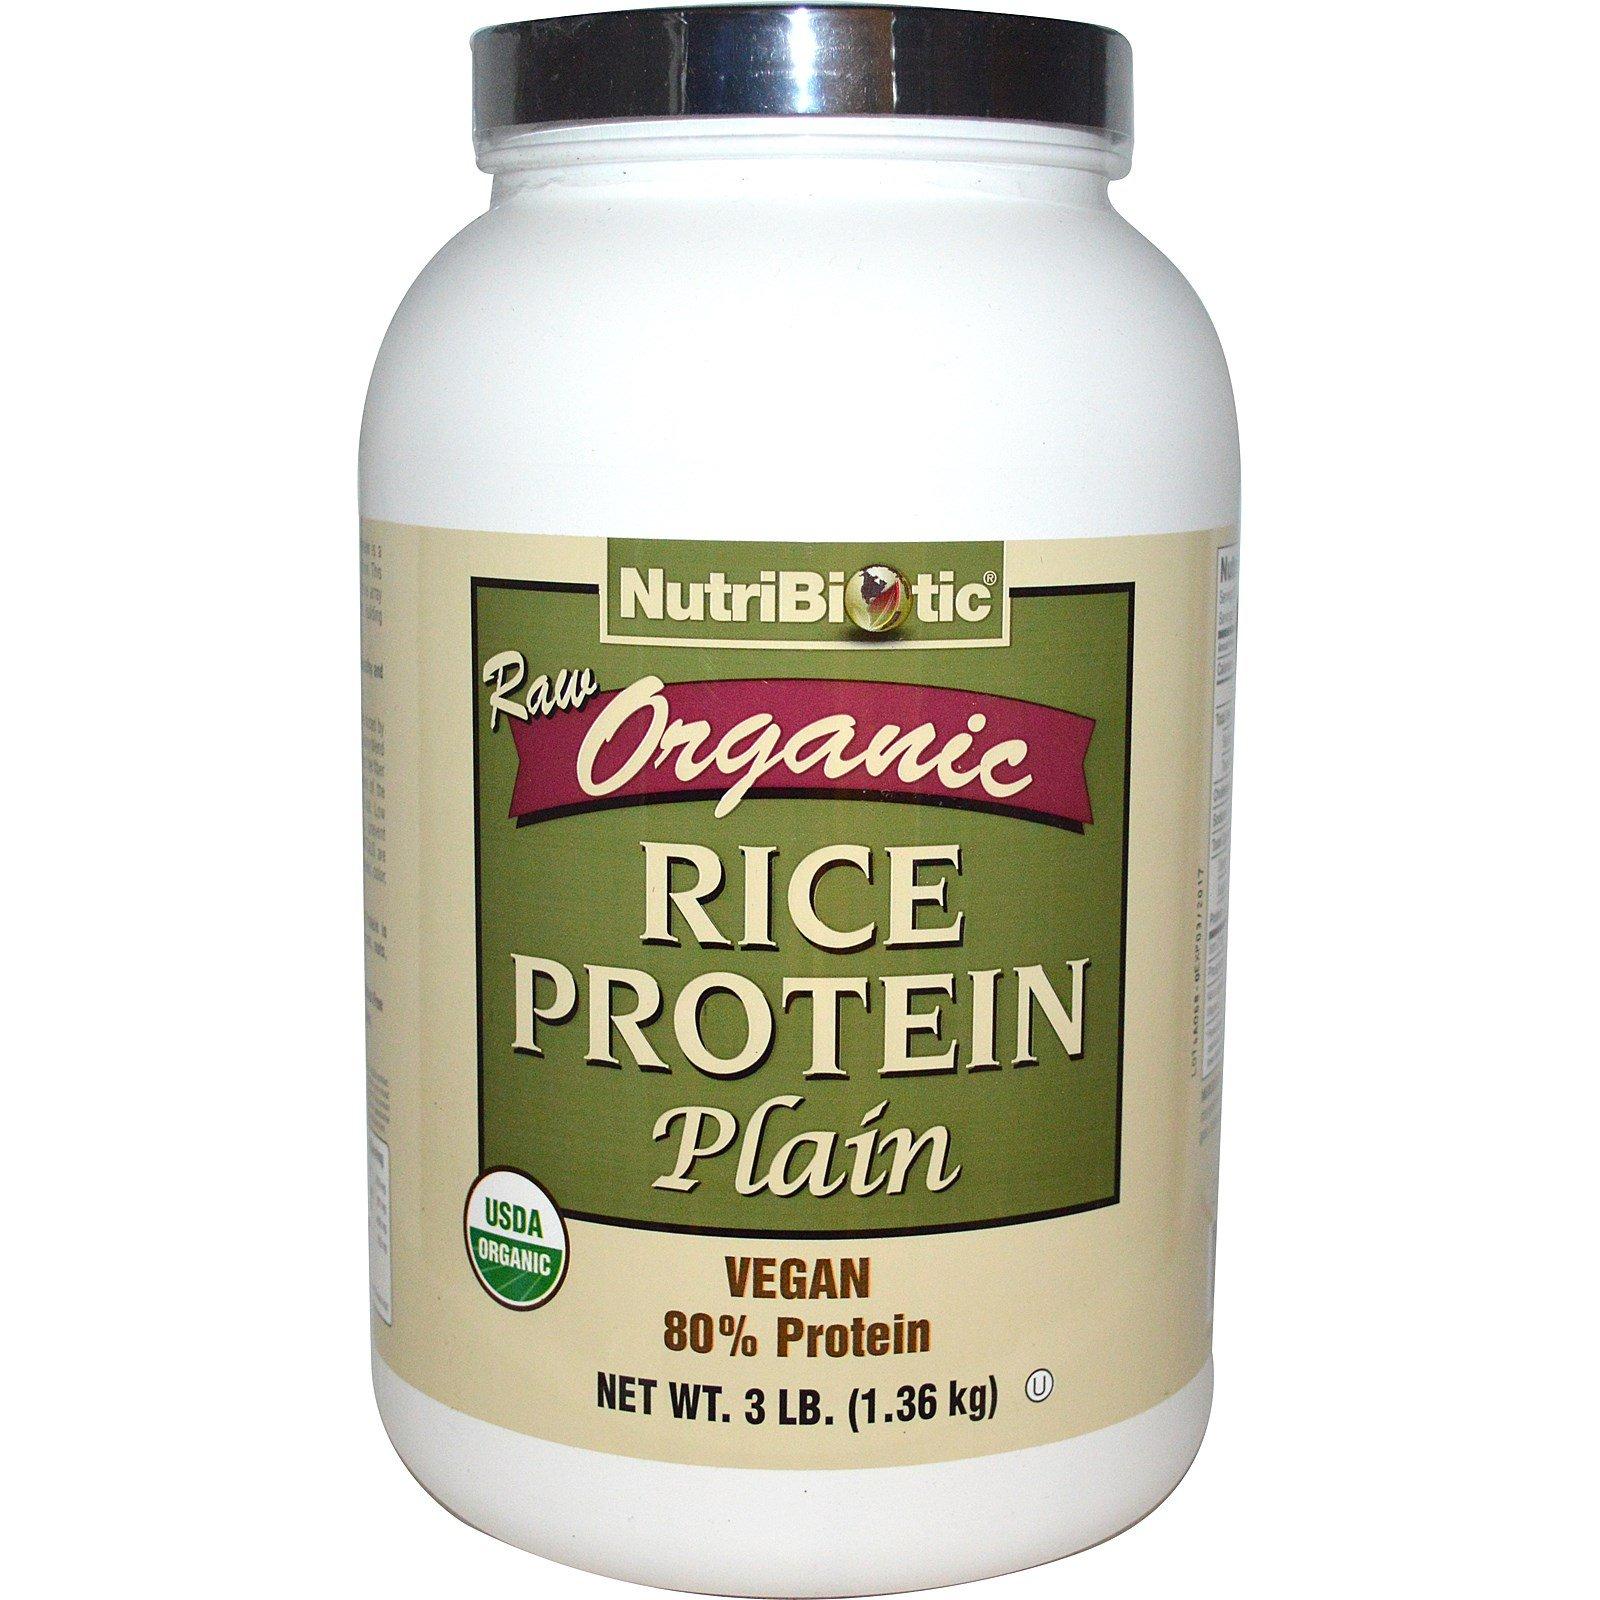 NutriBiotic, Raw Organic Rice Protein, Plain, 3 lbs (1.36 kg) - 2pc